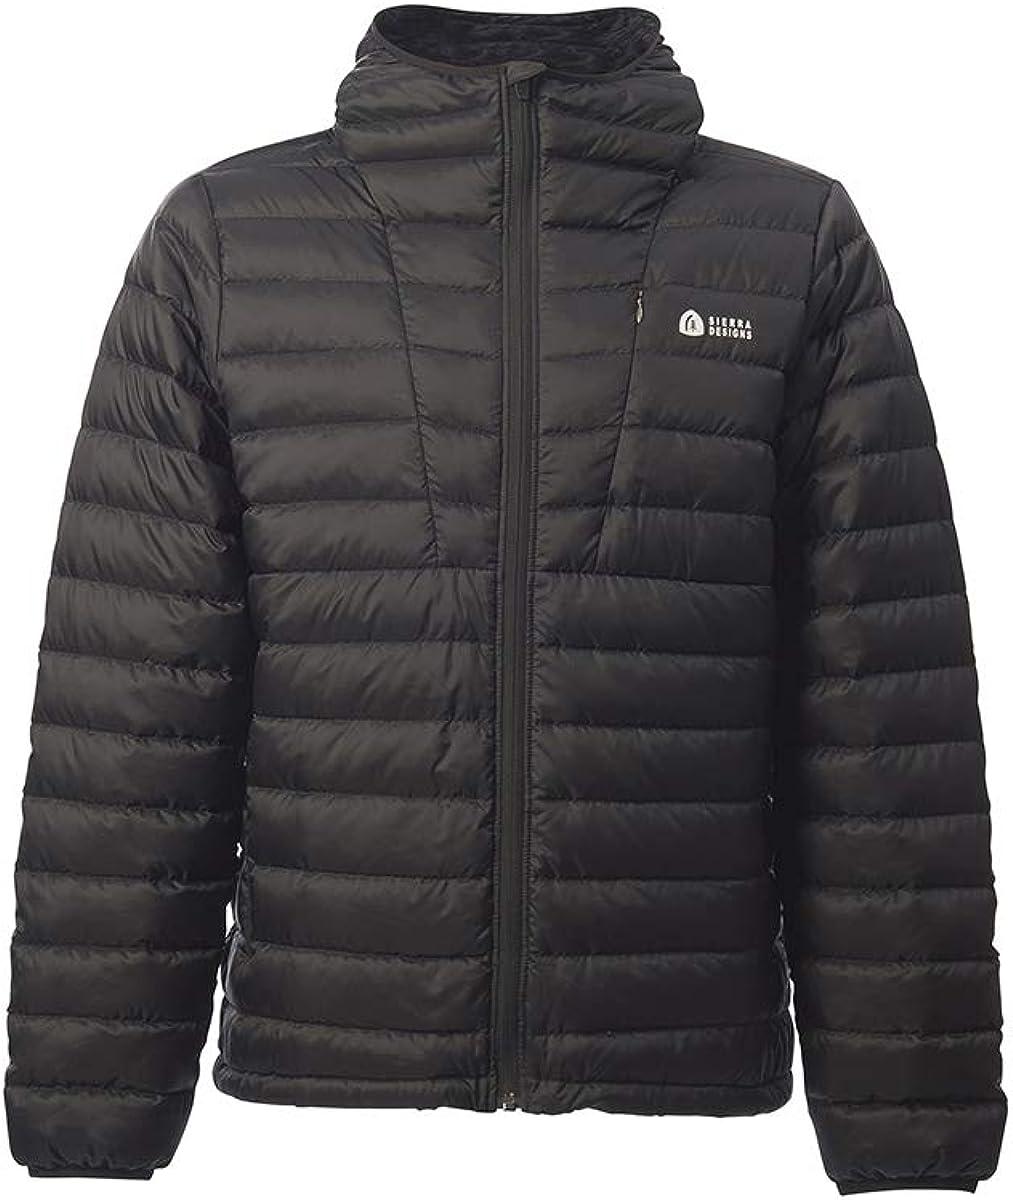 Sierra Designs Men's Whitney Jacket, 800 Fill DriDown Insulation, Packable and Hooded Winter Jacket